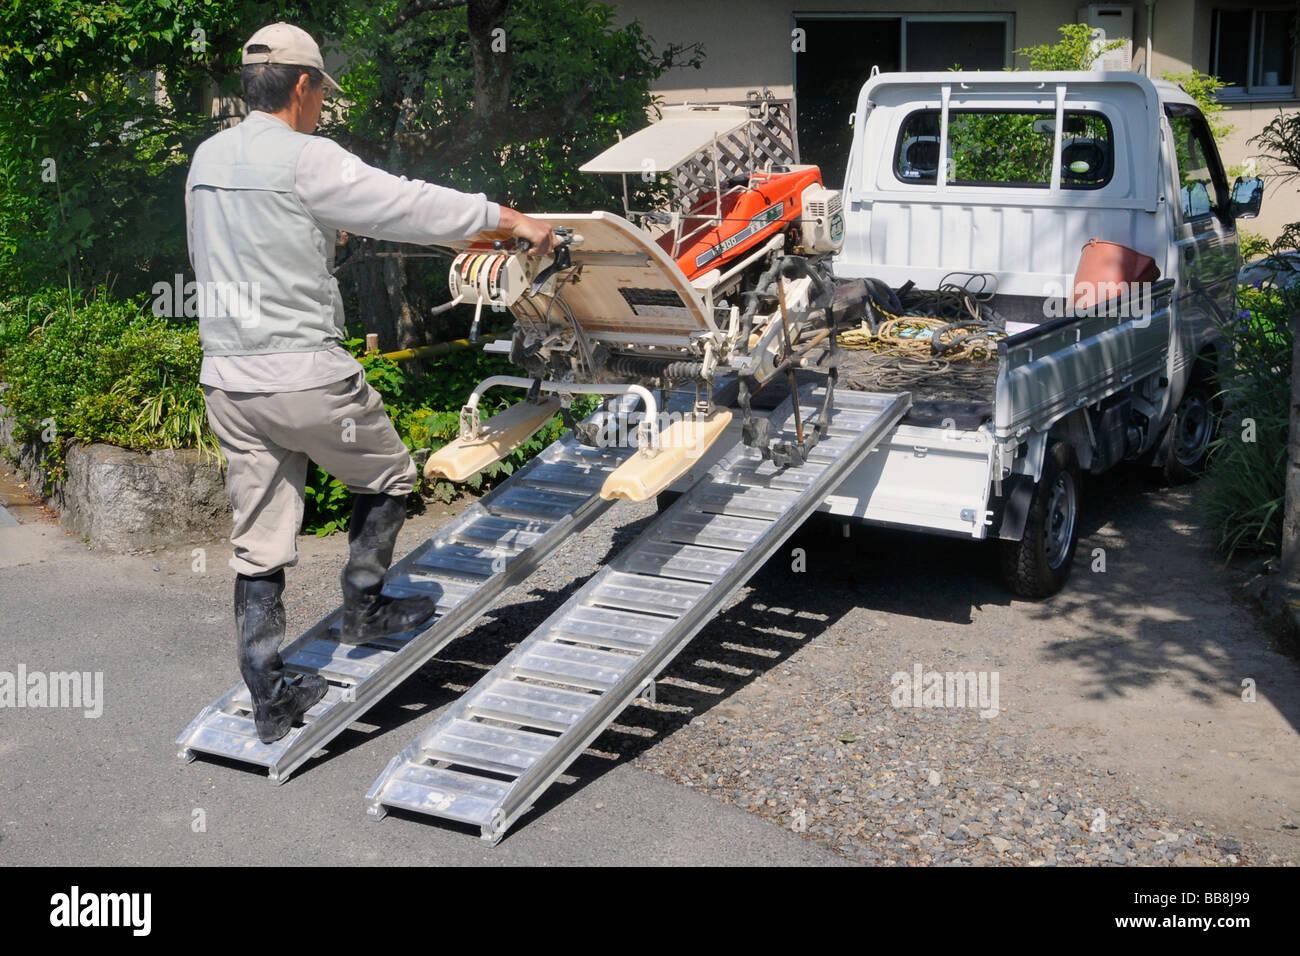 Rice farmer loading his rice-planting machine on to his small truck, Iwakura, Kyoto, Japan, Asia - Stock Image